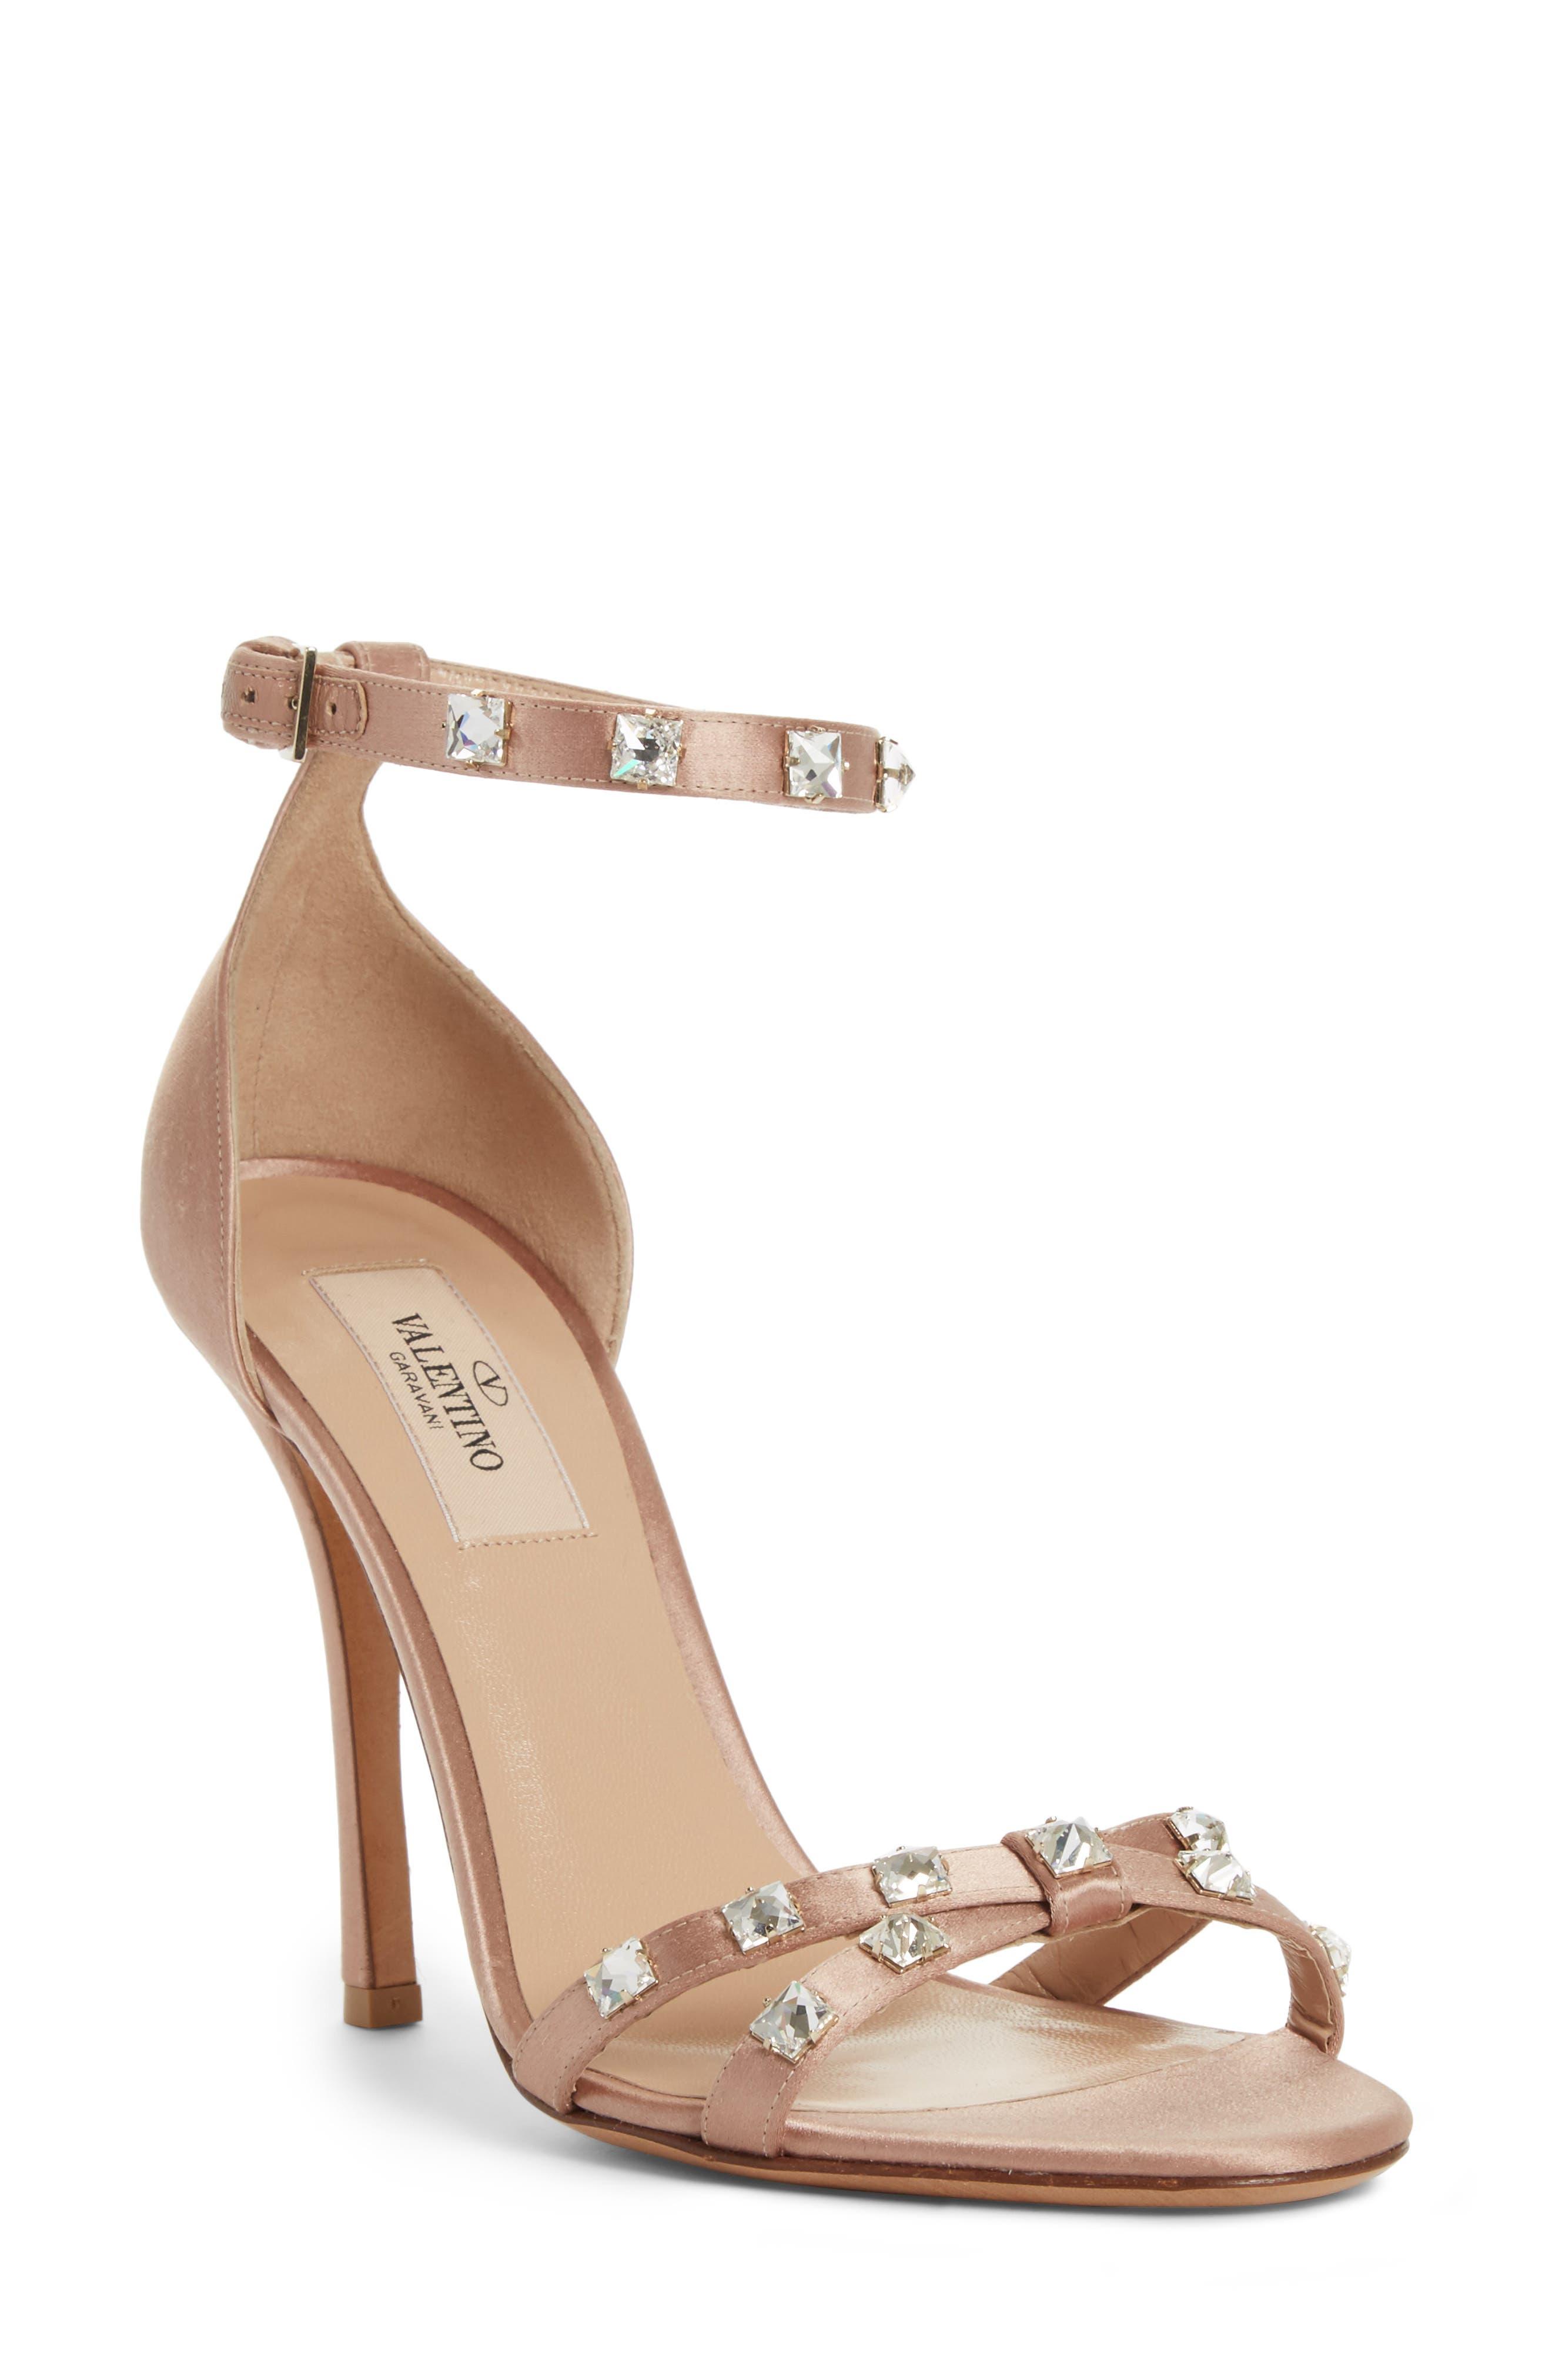 Rockstud Glam Ankle Strap Sandal,                             Main thumbnail 1, color,                             Beige